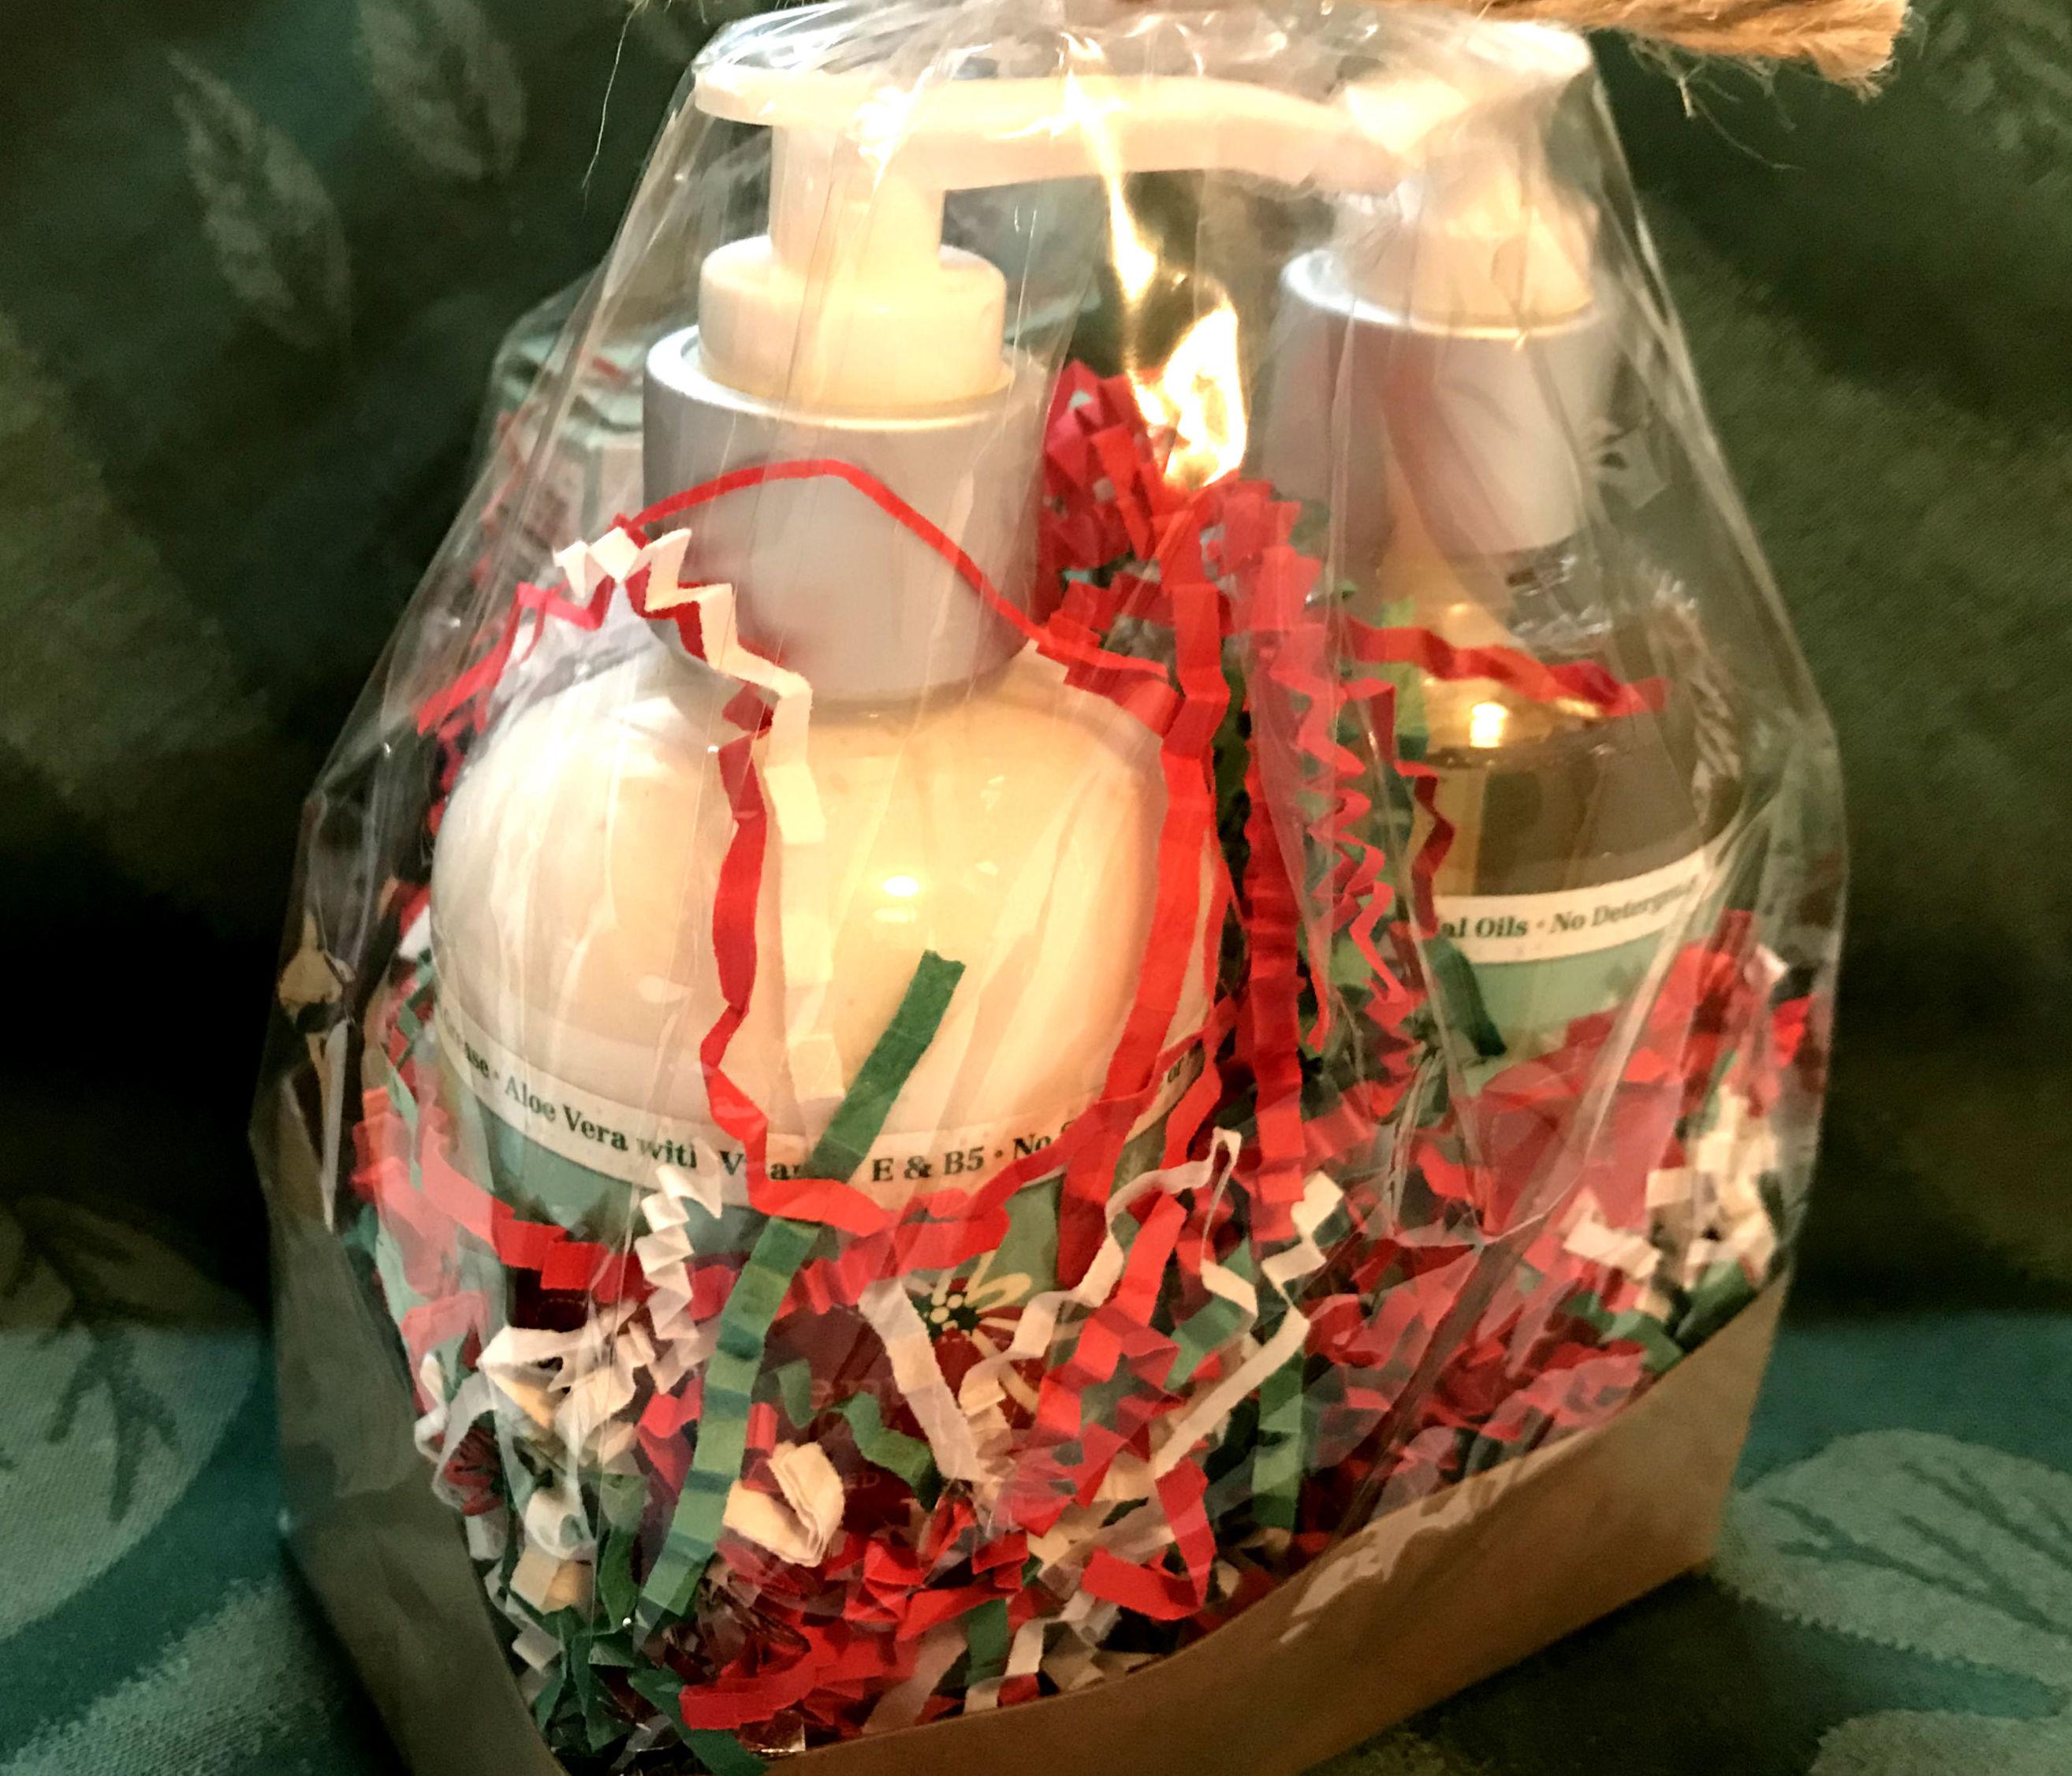 Special offers parish house inn bb ypsilanti mi gift basket solutioingenieria Image collections